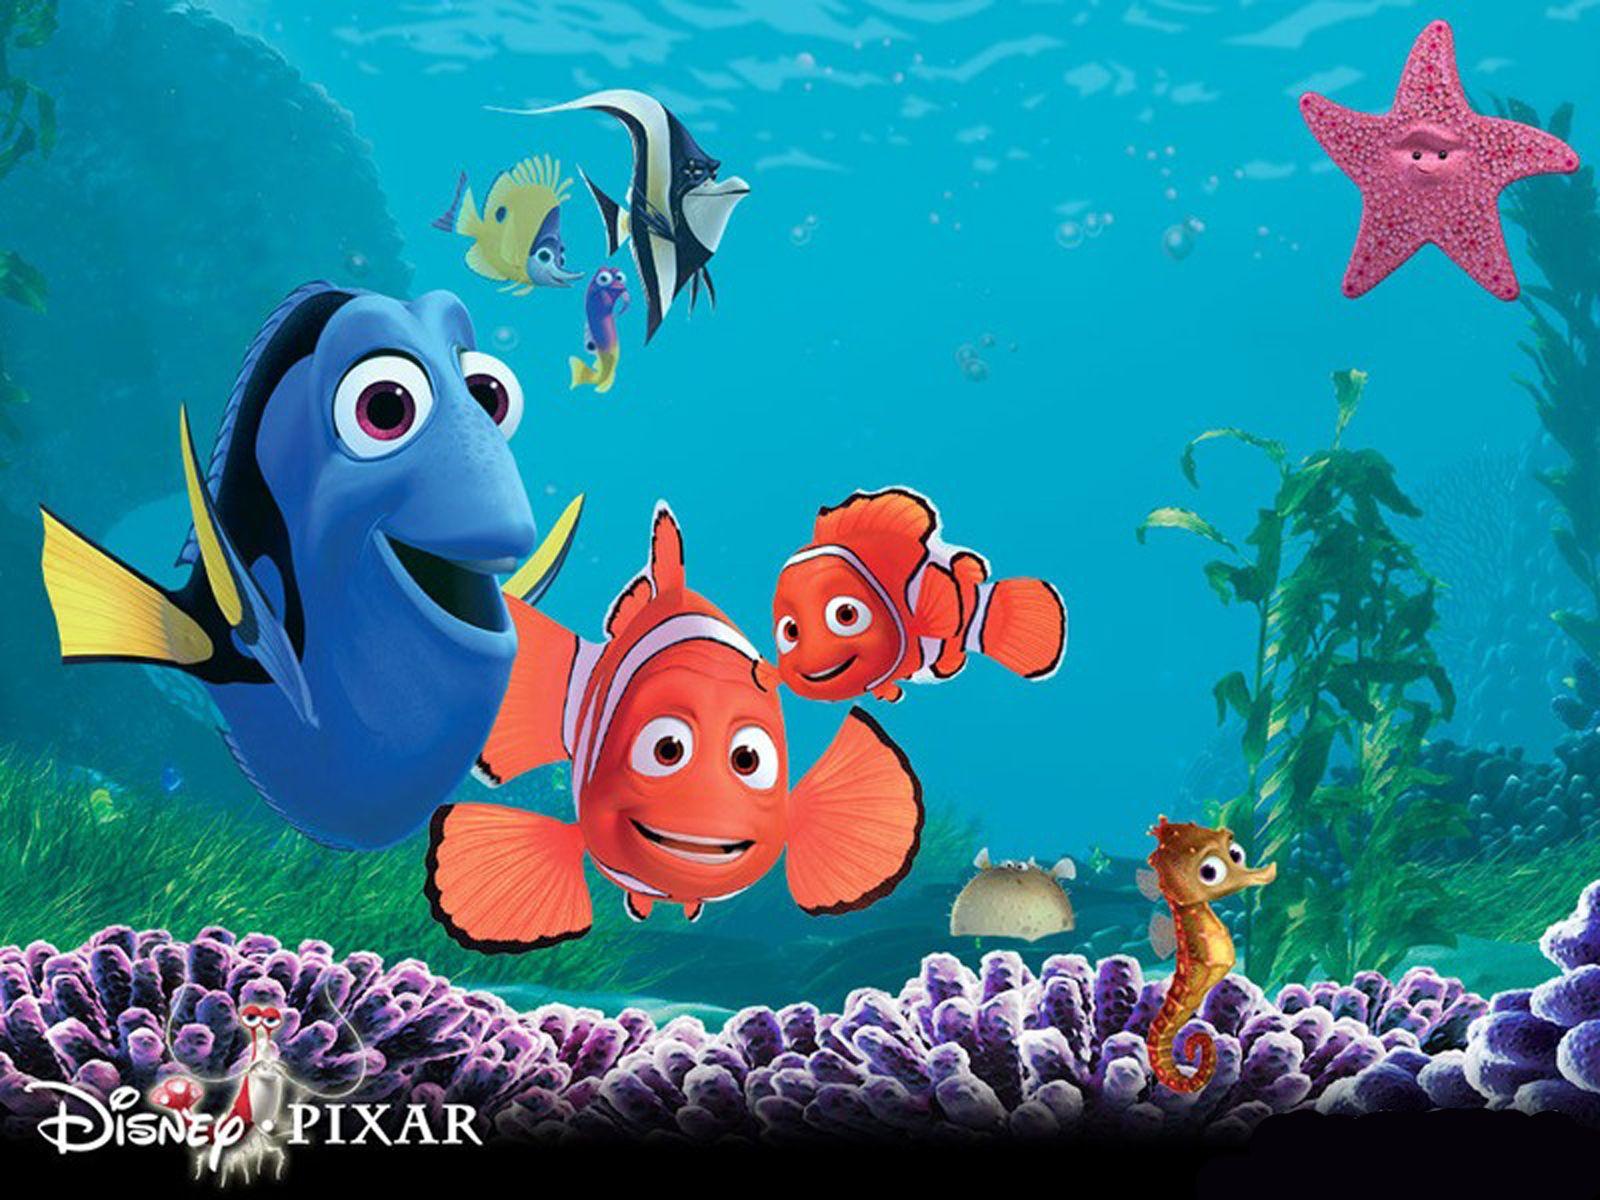 Finding Nemo 3d Poster Wallpaper 3 1600x1200